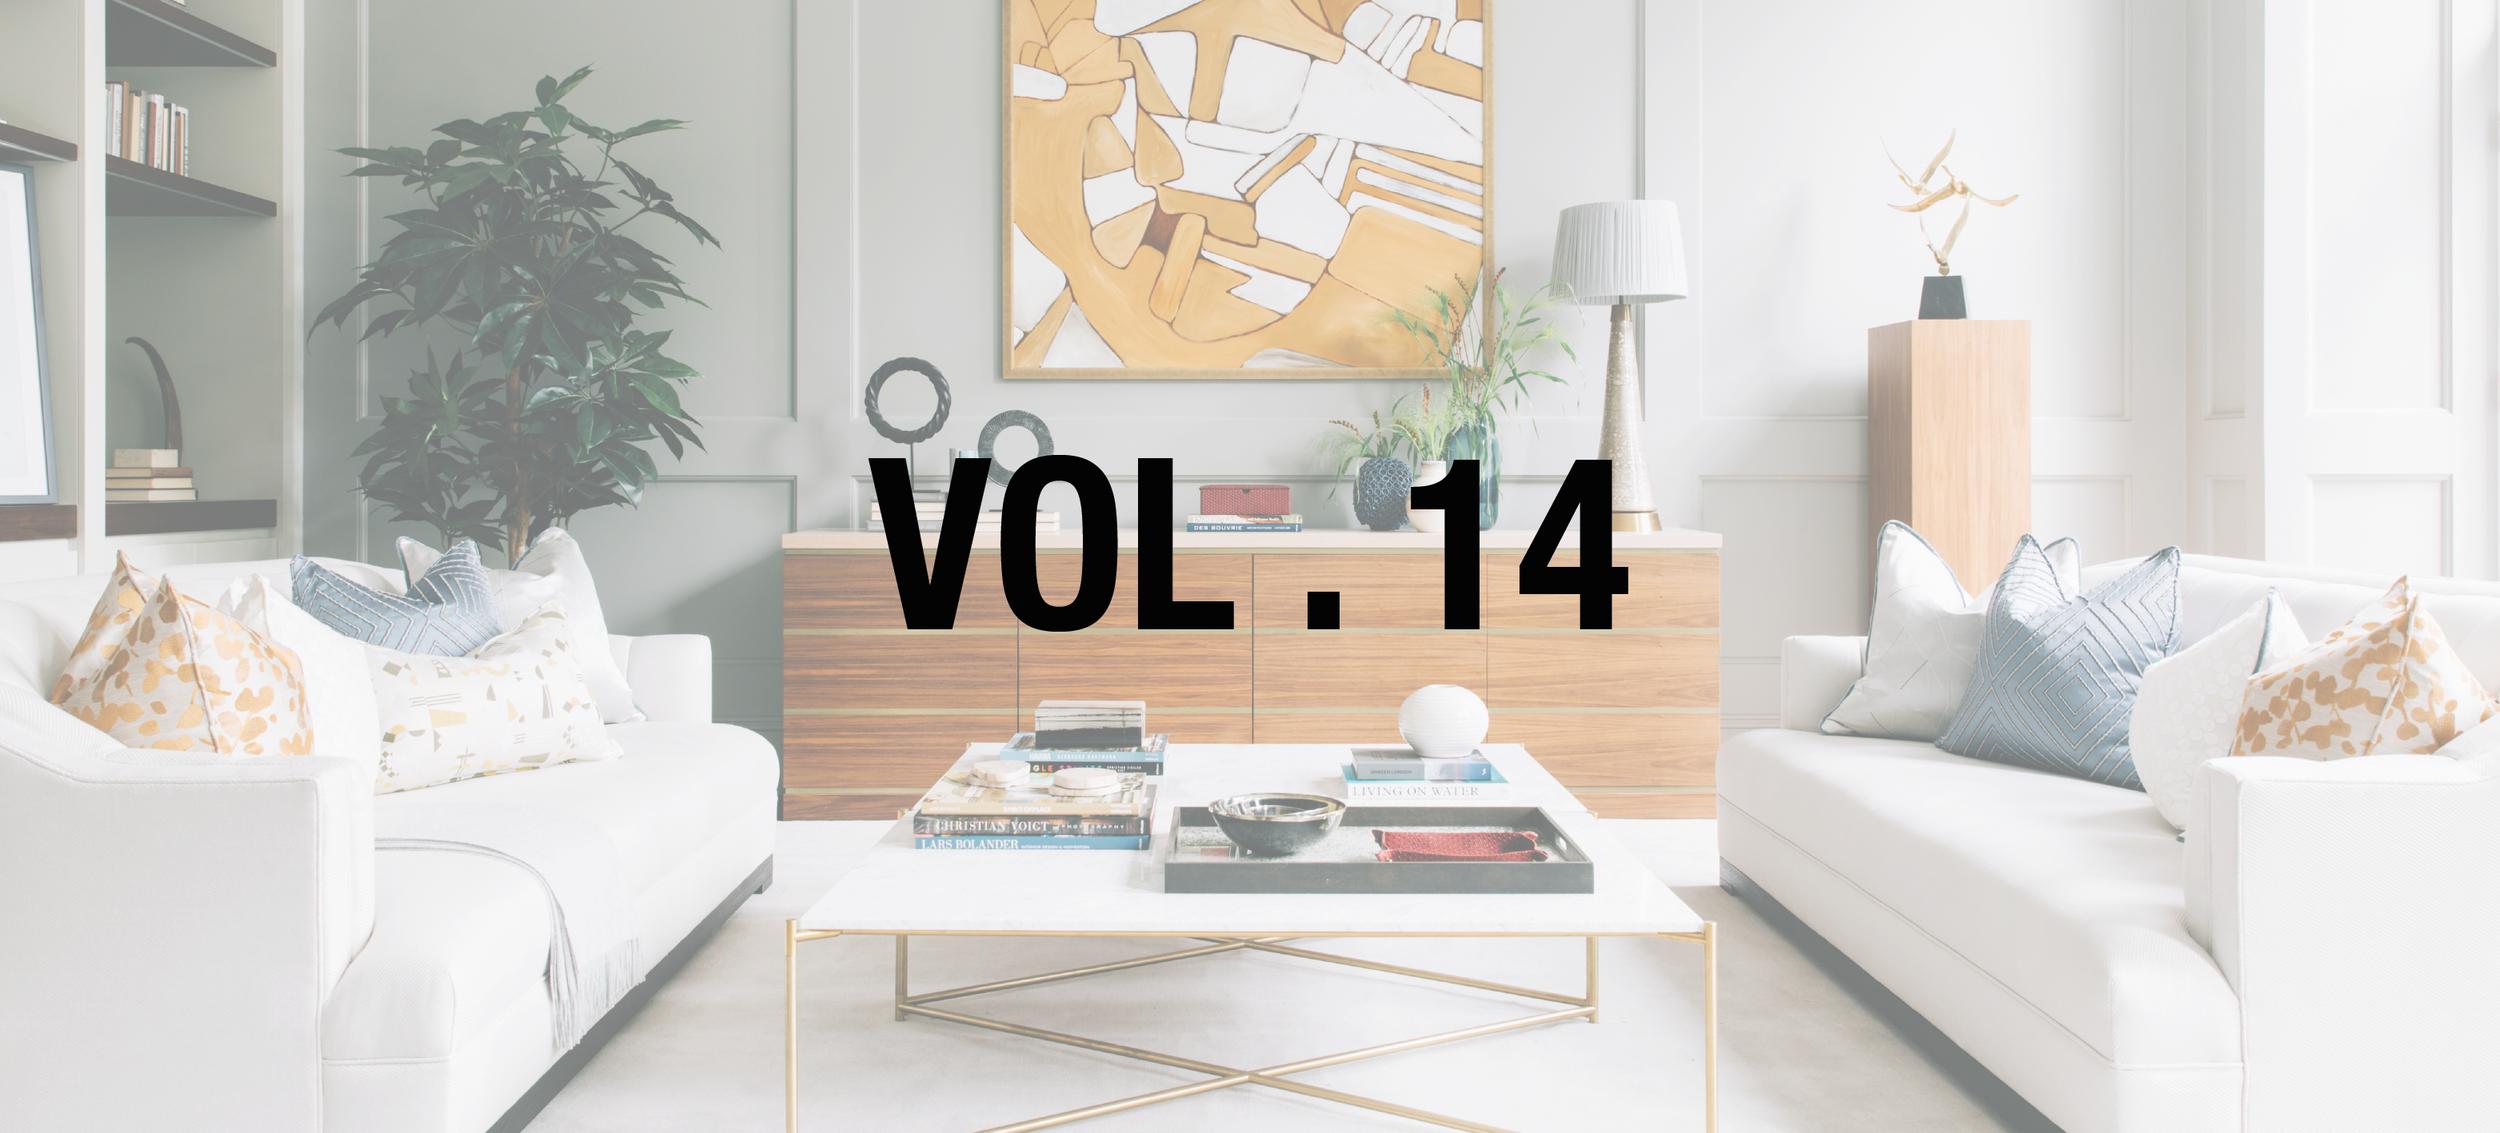 Vol14_Wesbite- Volume No.png